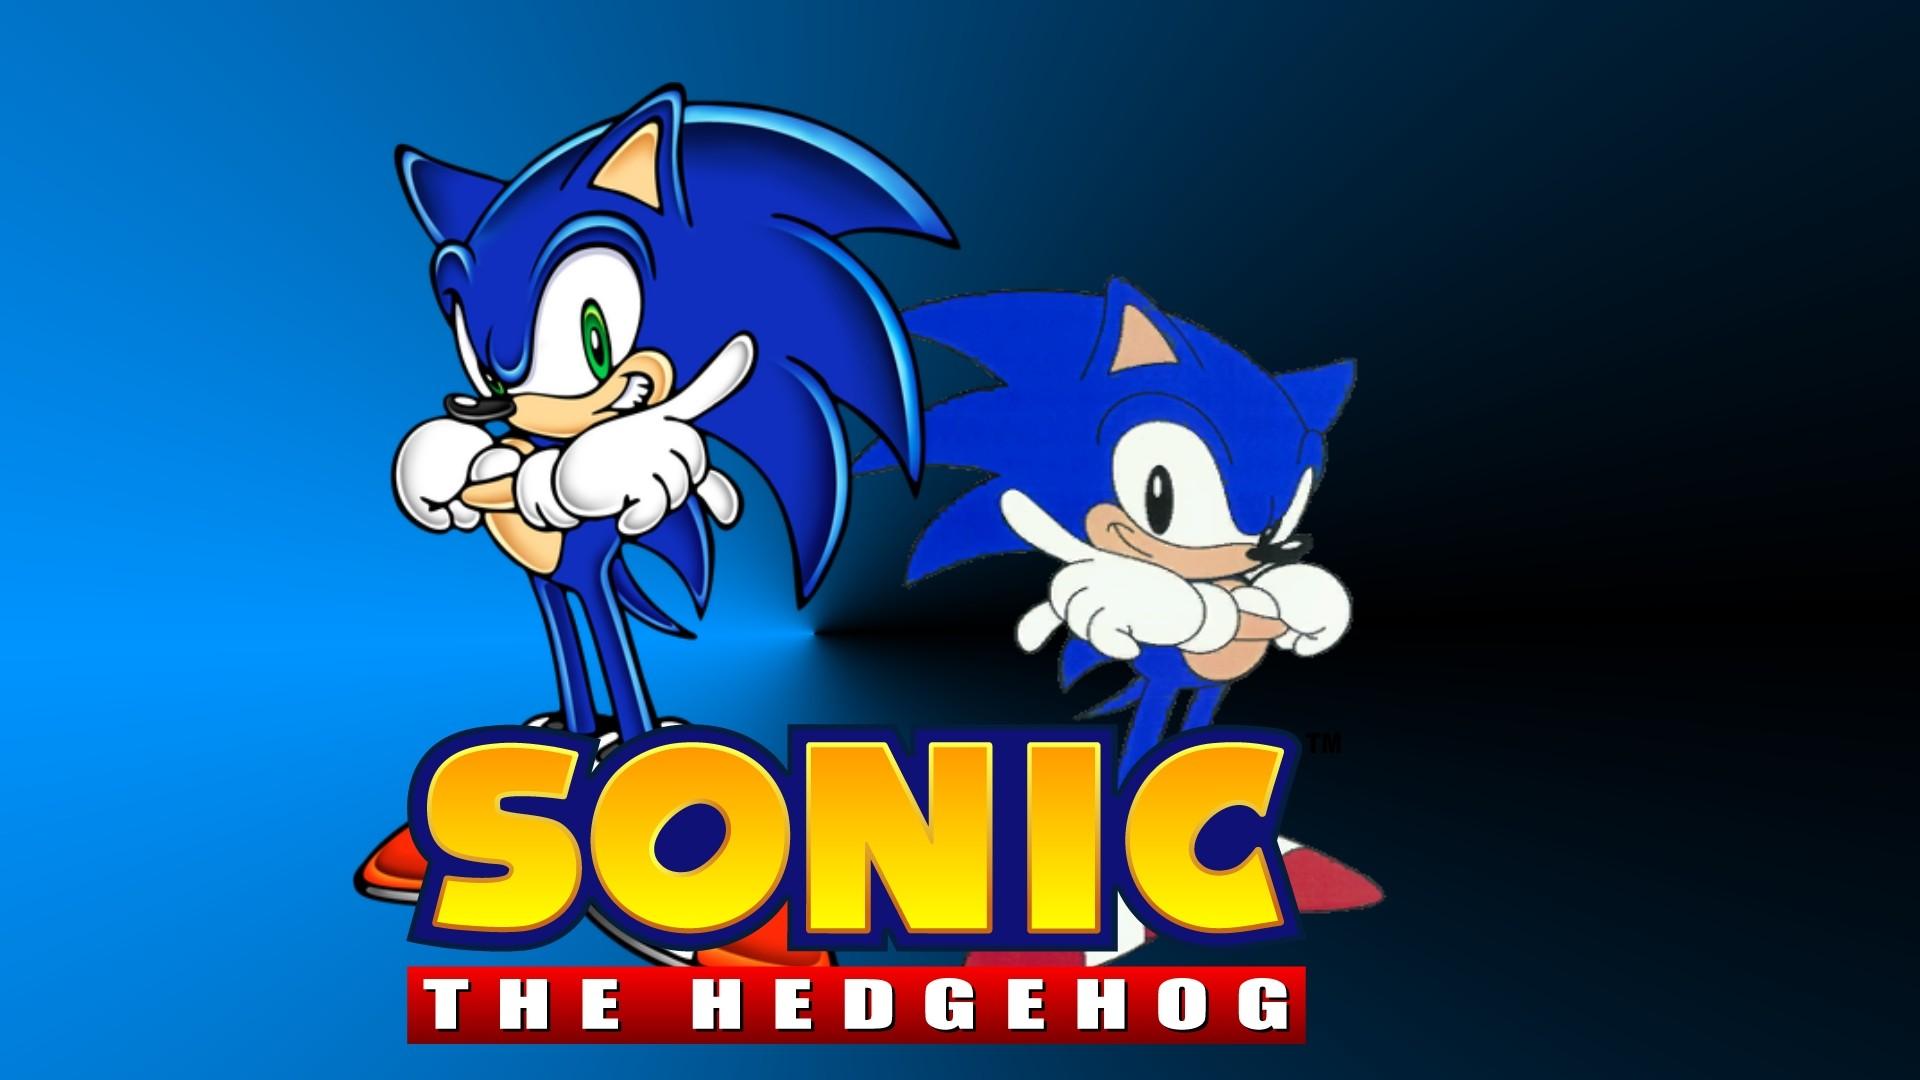 … Sonic the Hedgehog – Fanart – Background …